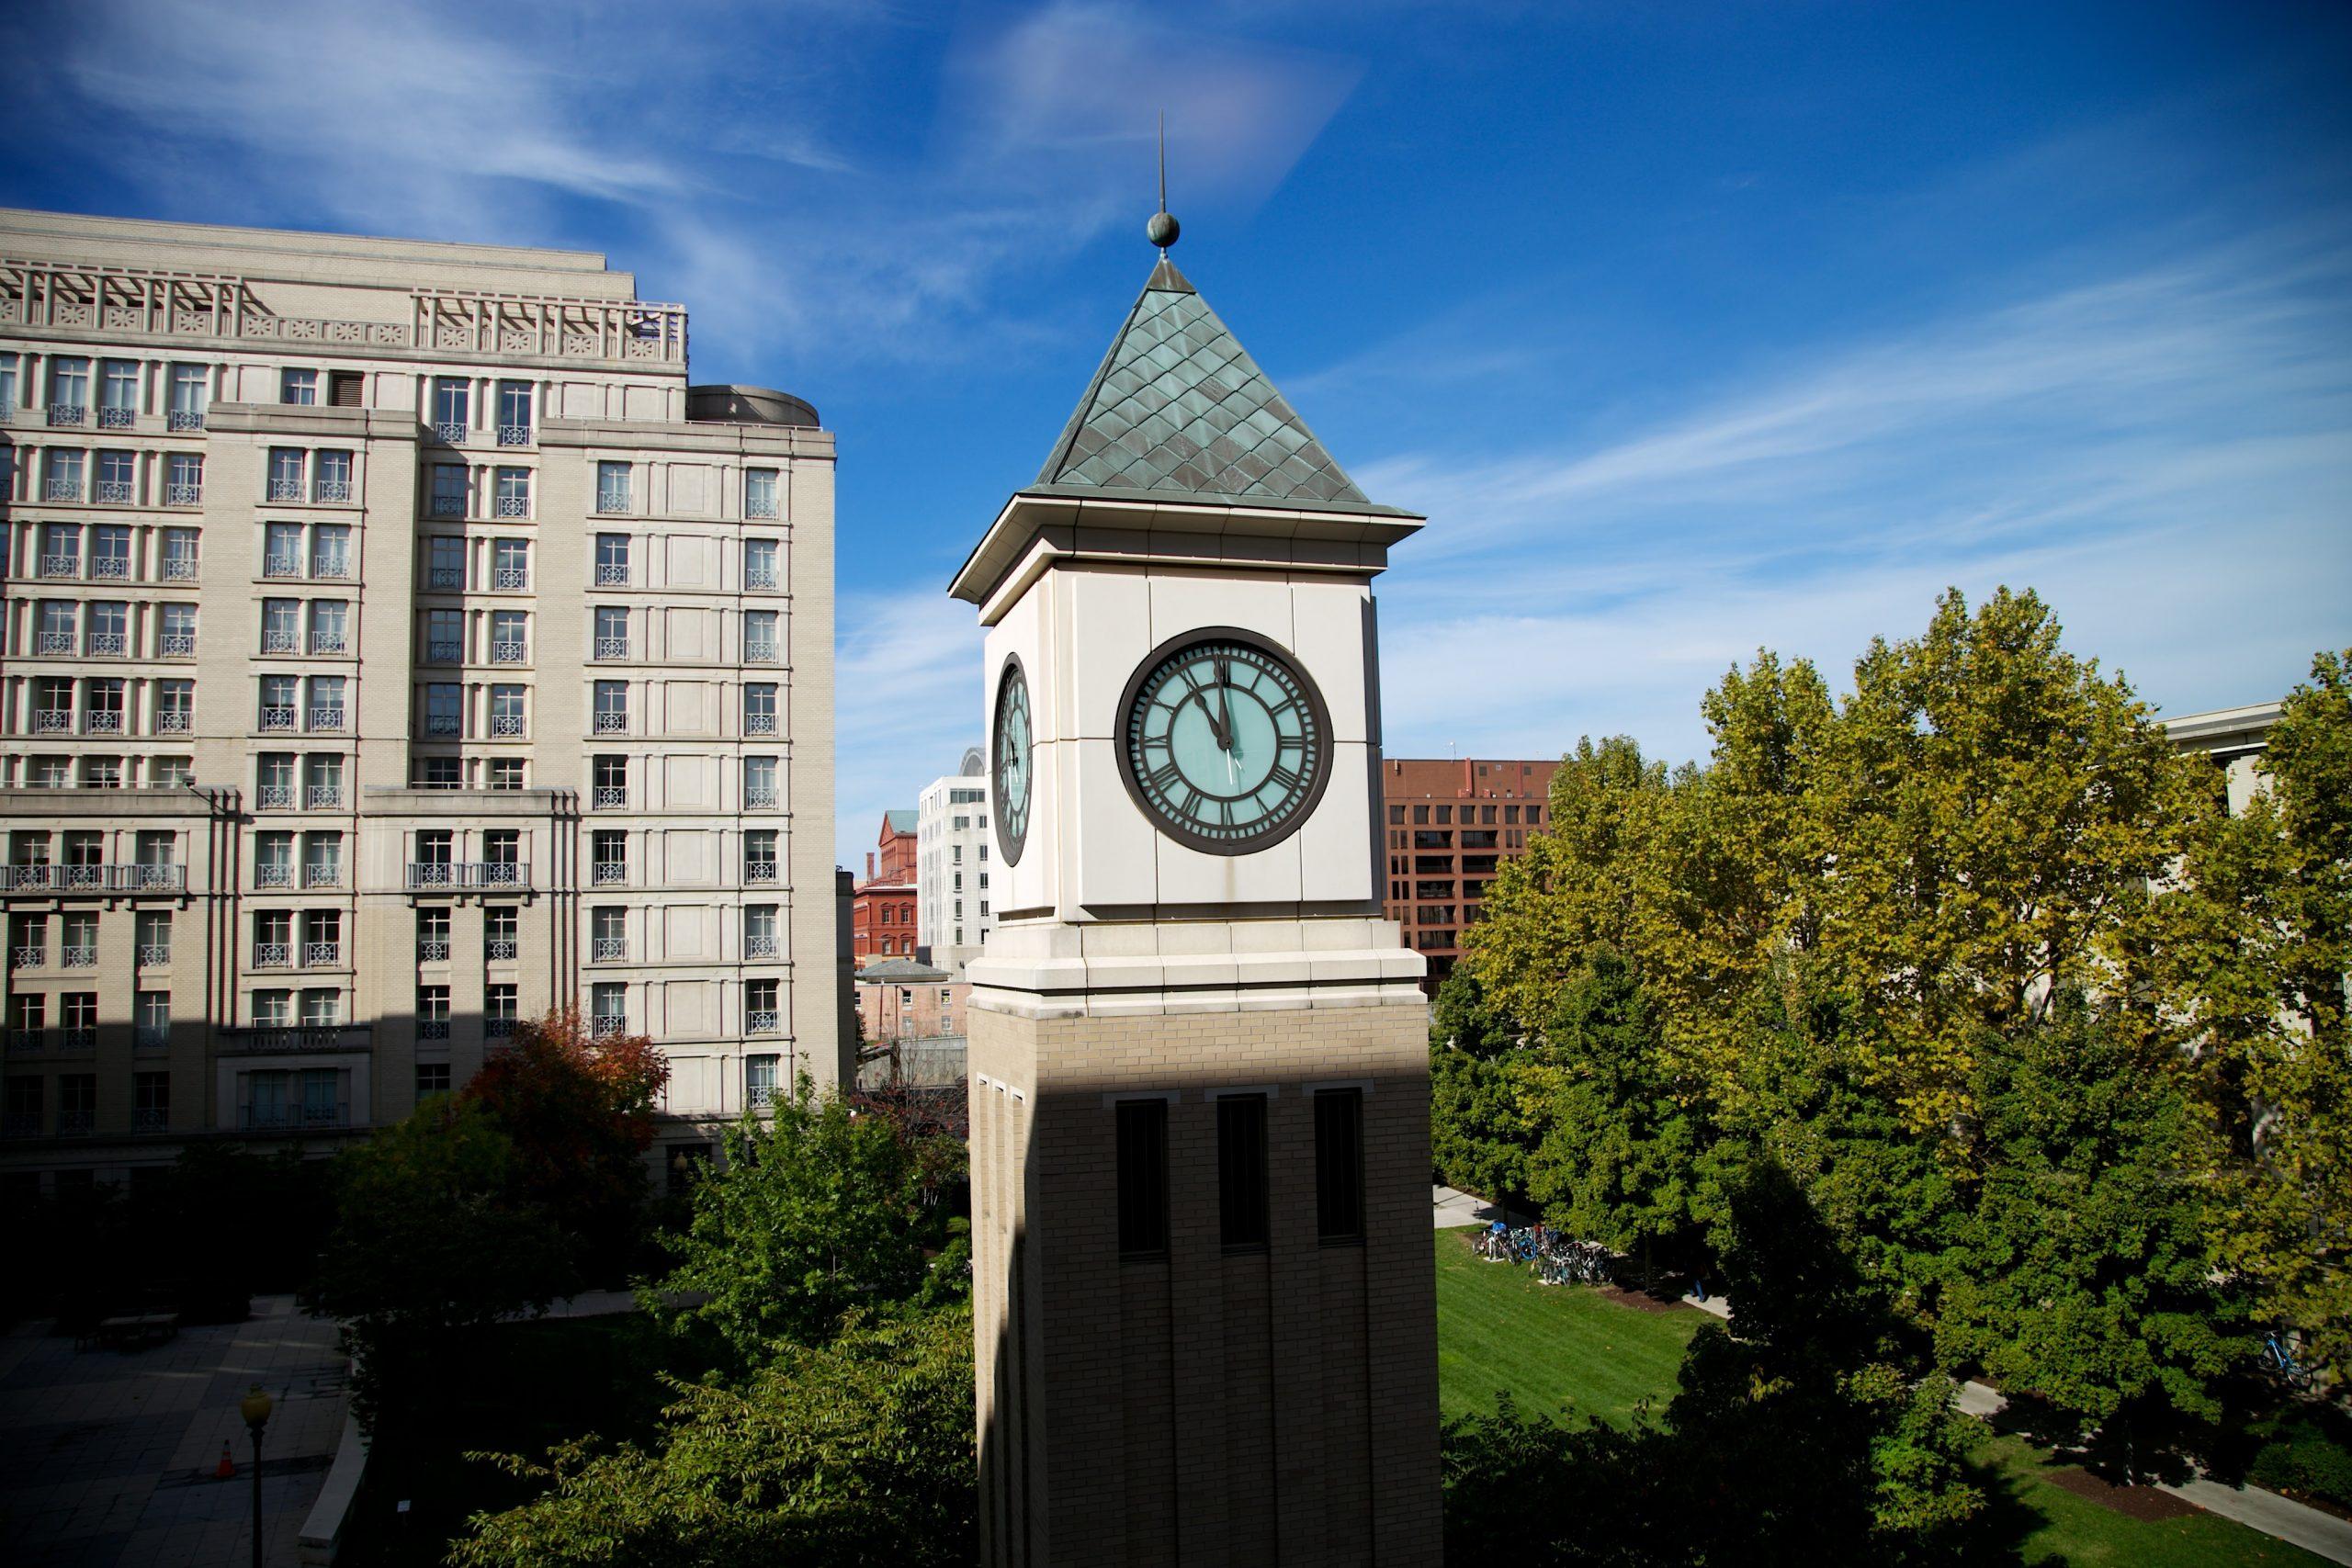 Georgetown Law Clocktower